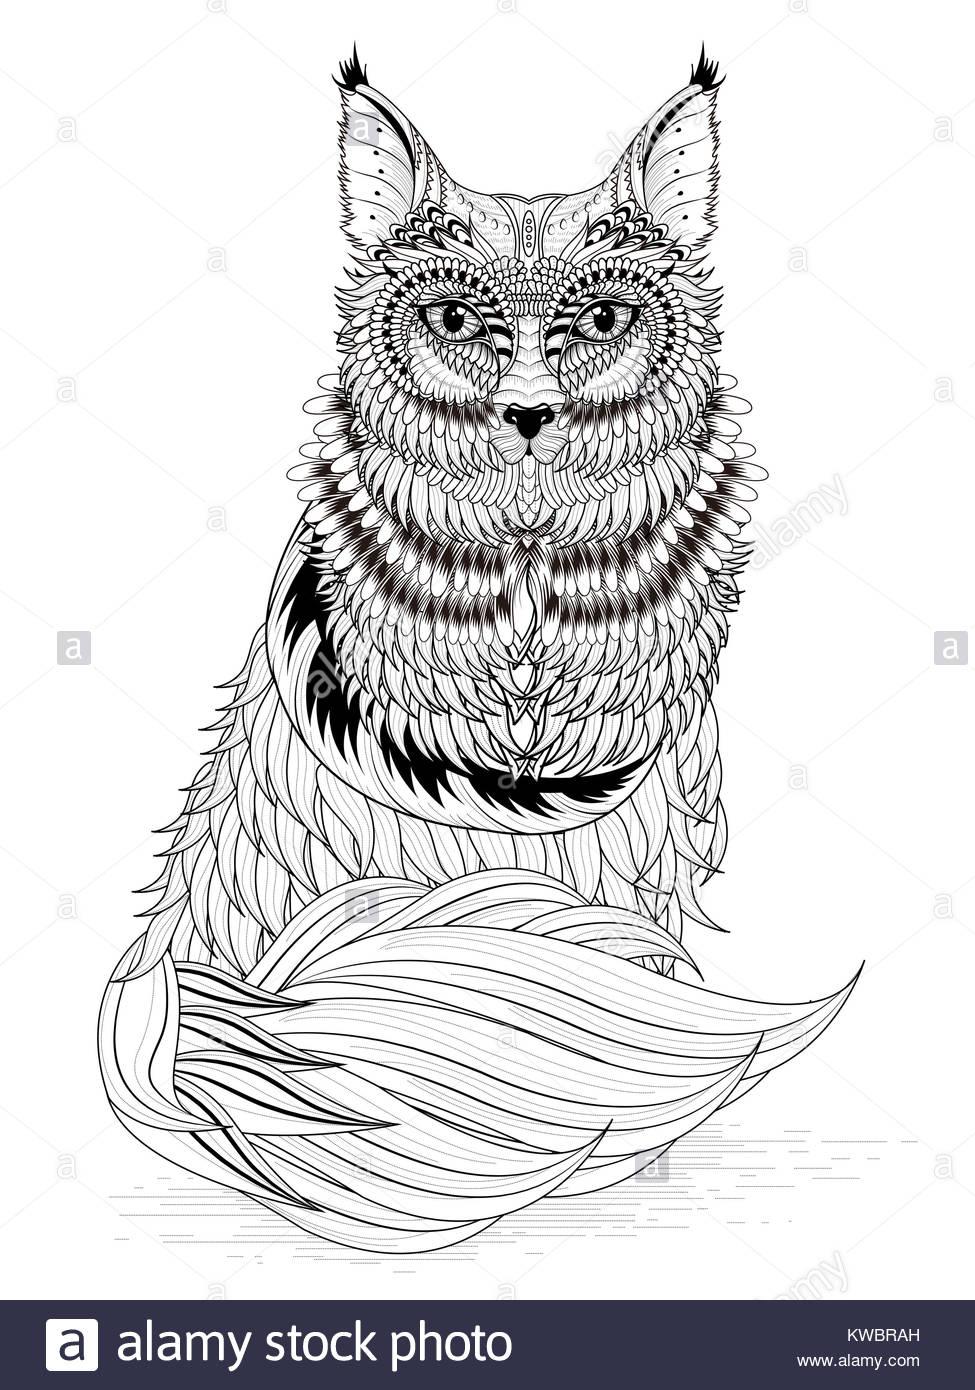 Black White Fox Vector Imágenes De Stock & Black White Fox Vector ...